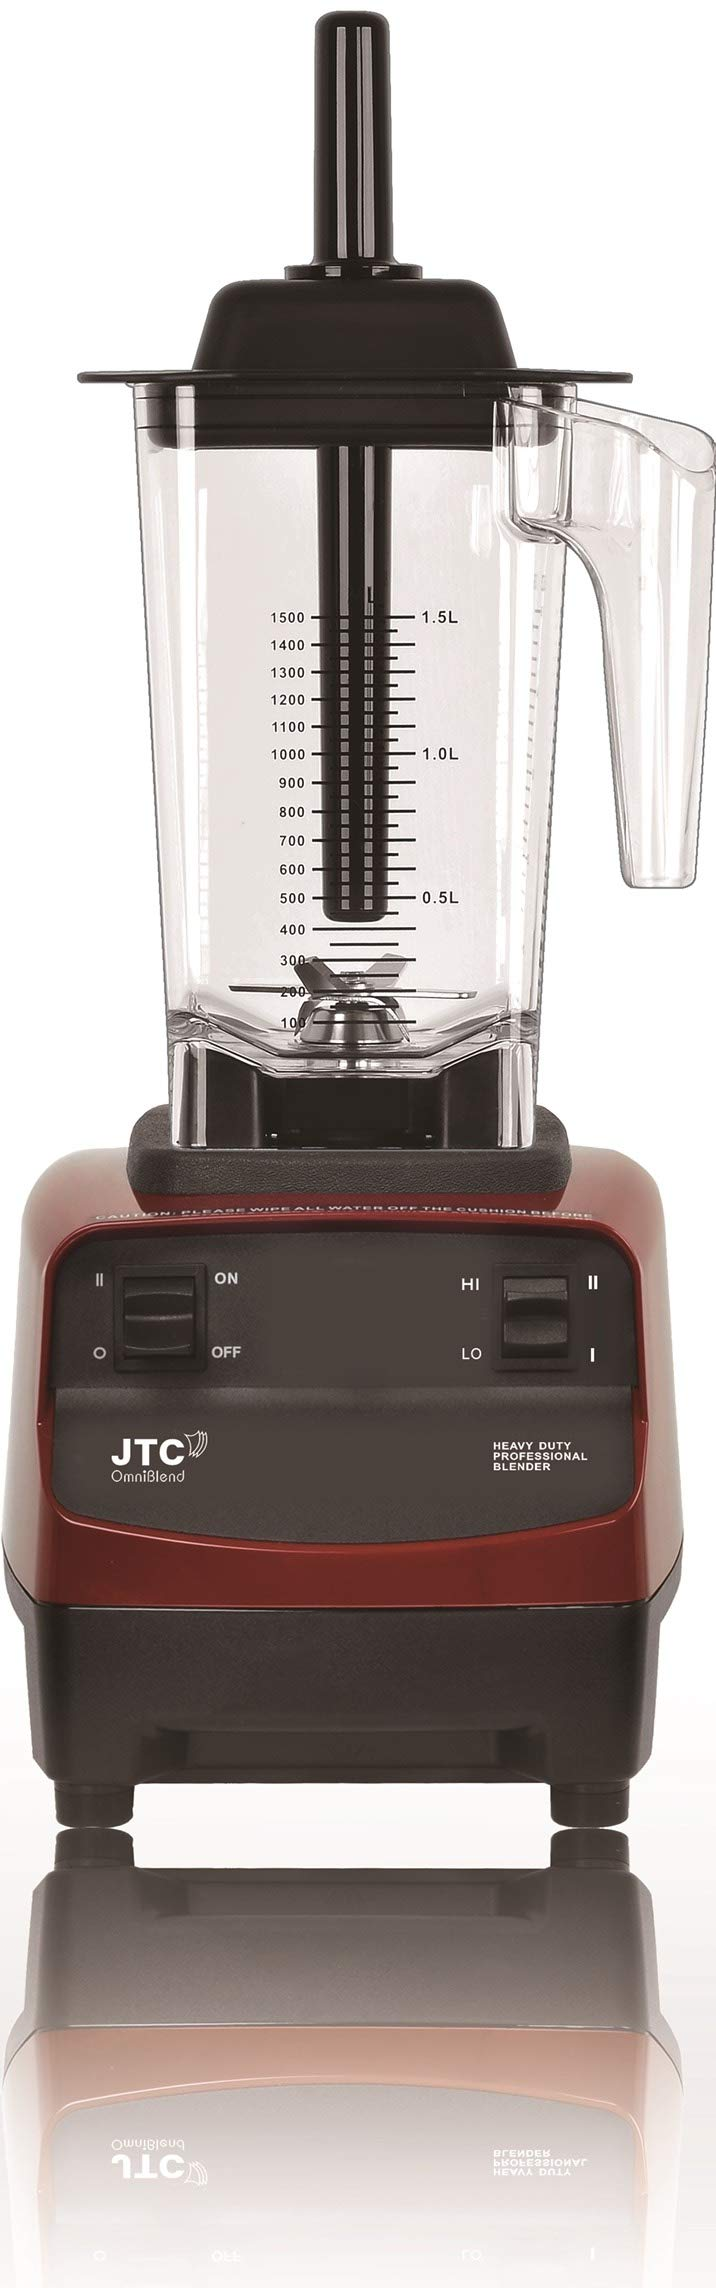 OmniBlend III Commercial Blender for Smoothies, Heavy Duty 2-Speed, Self Cleaning, 2-in-1 Wet Dry Multifunctional, 1.5 Liter BPA-Free Shatter-Proof Jar (Maroon)